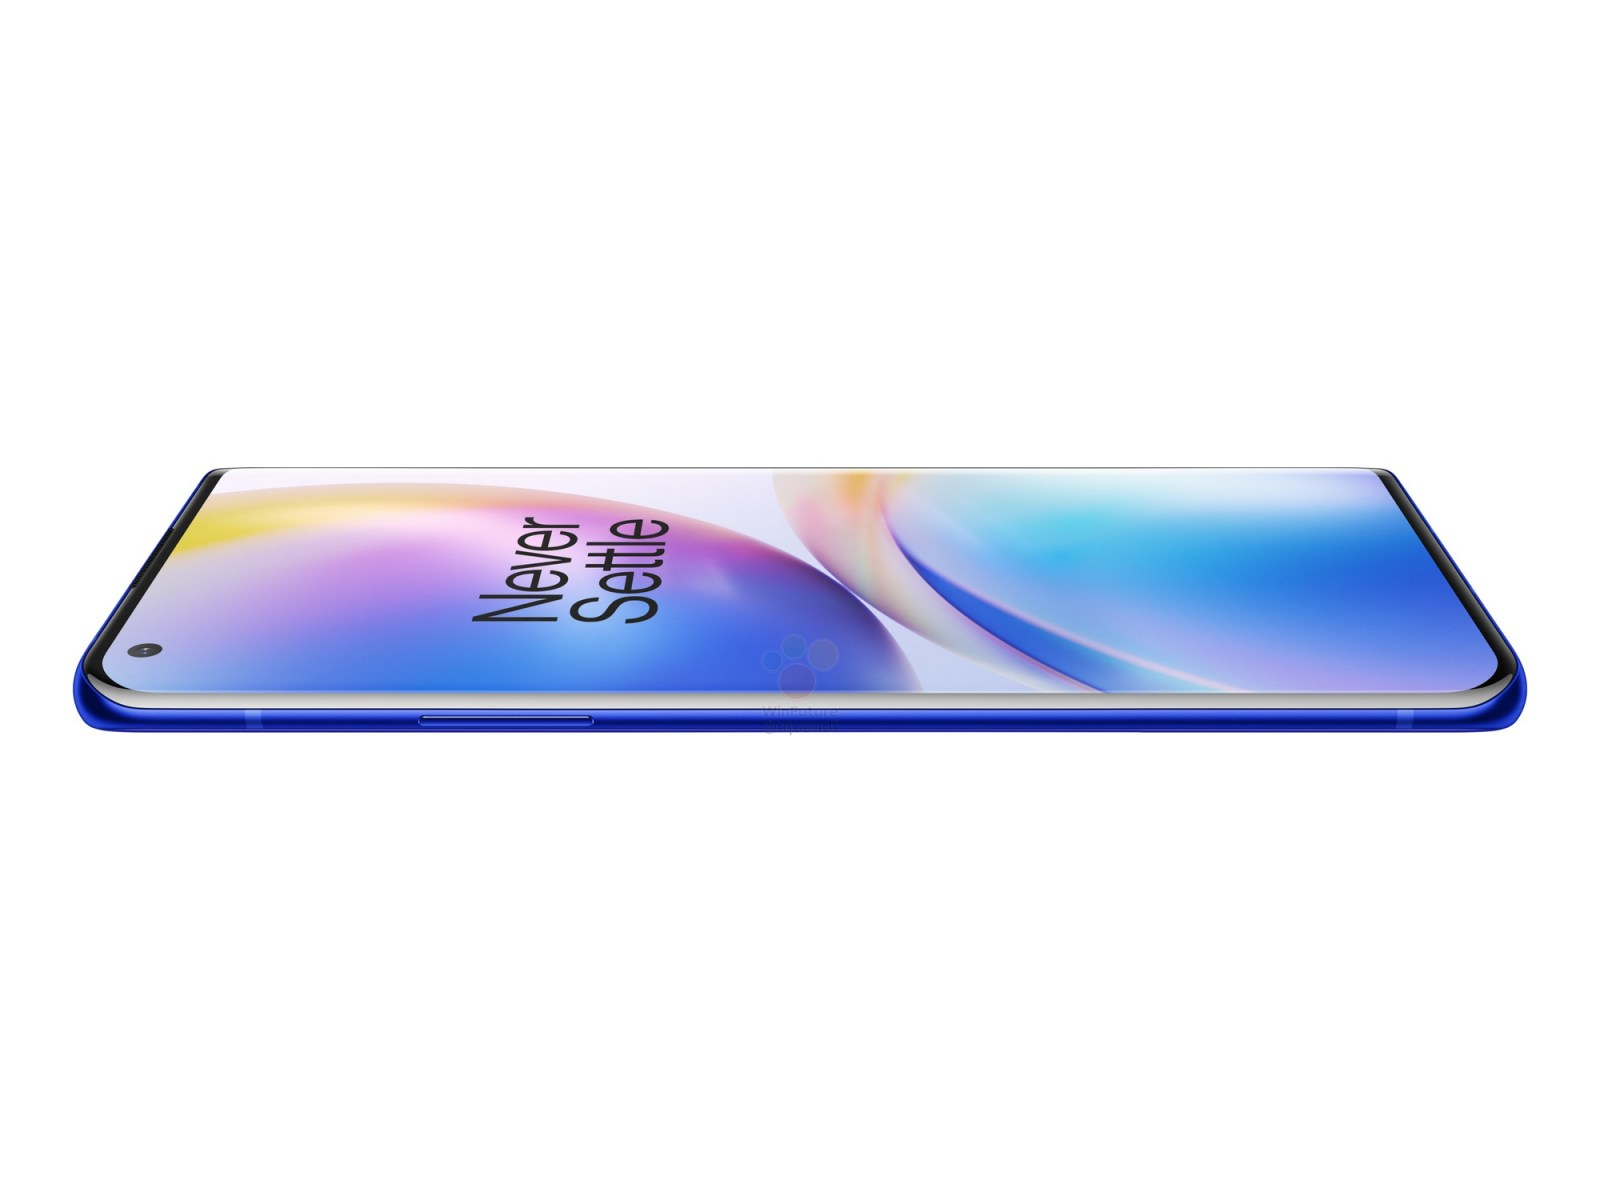 OnePlus 8 Pro Press Renders